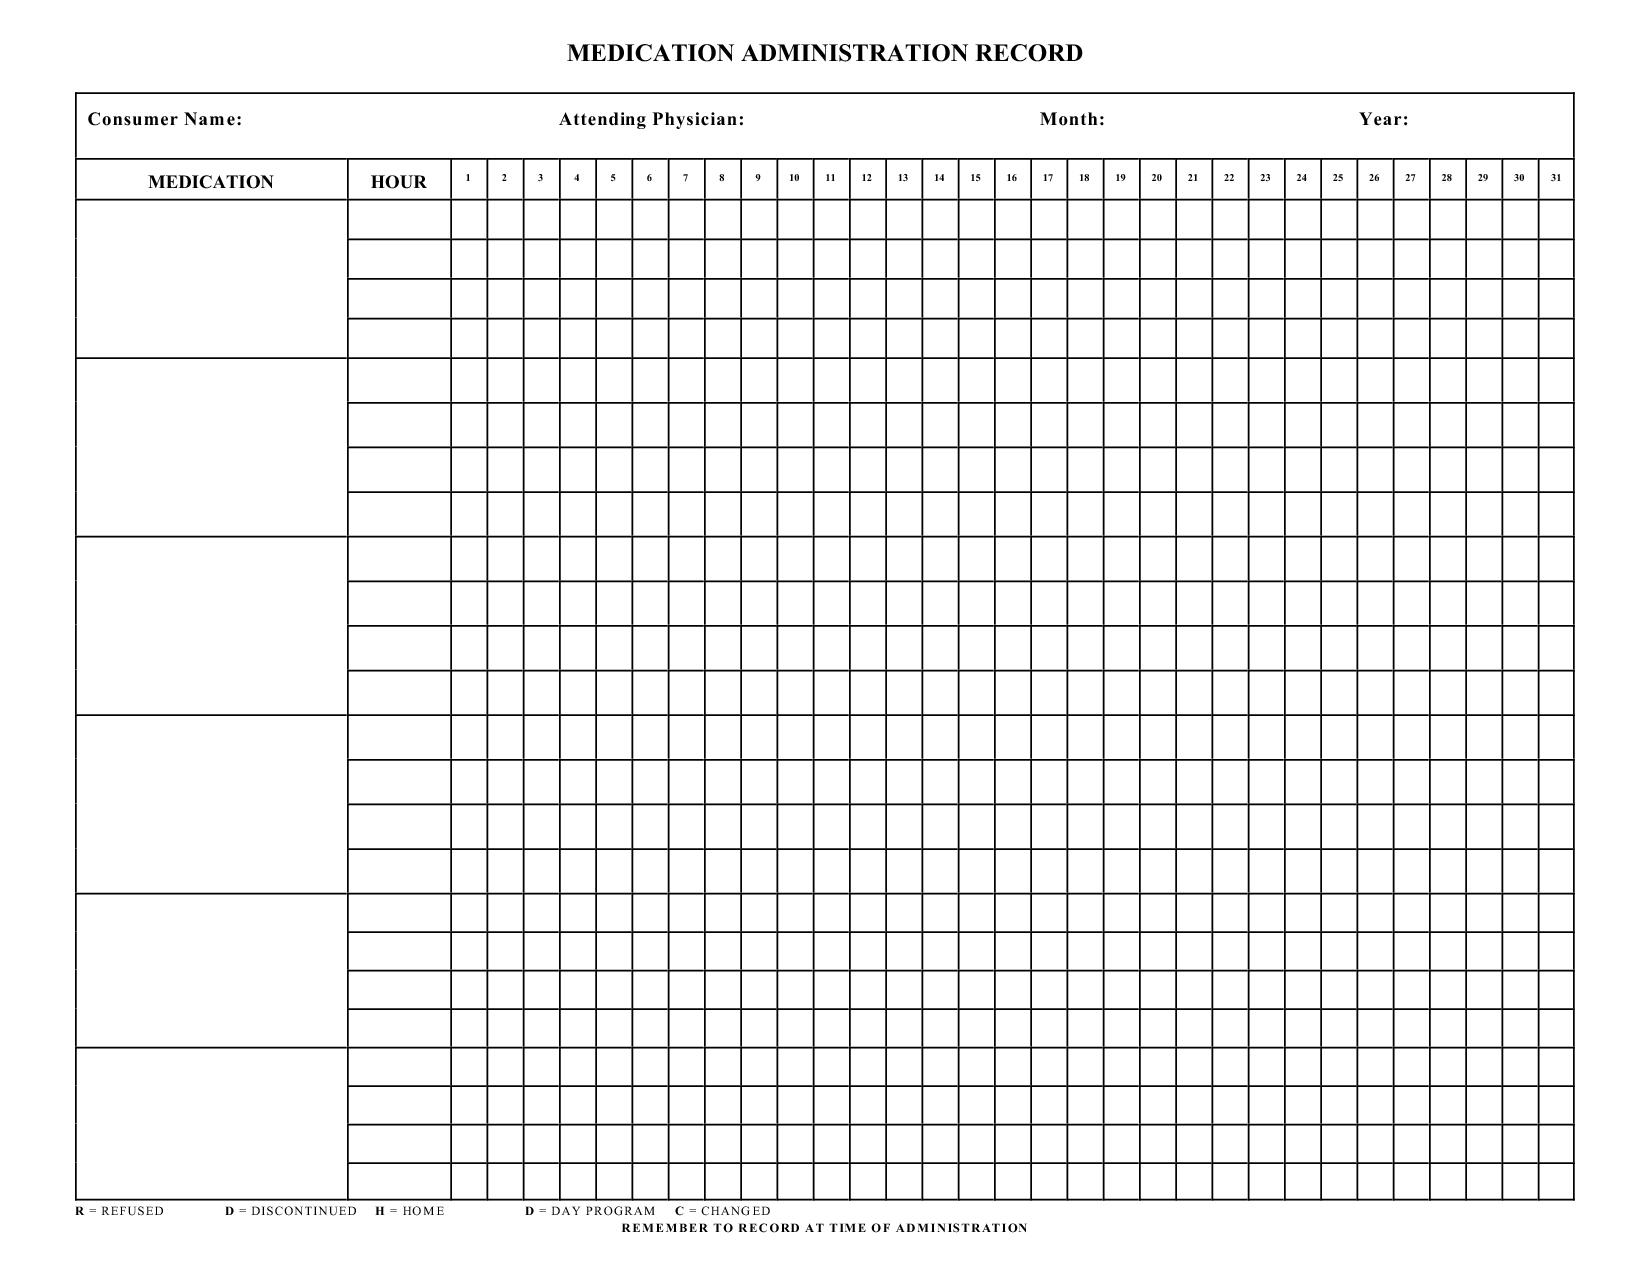 Blank+Medication+Administration+Record+Template | Mrs. Summers - Free Printable Medication Log Sheet